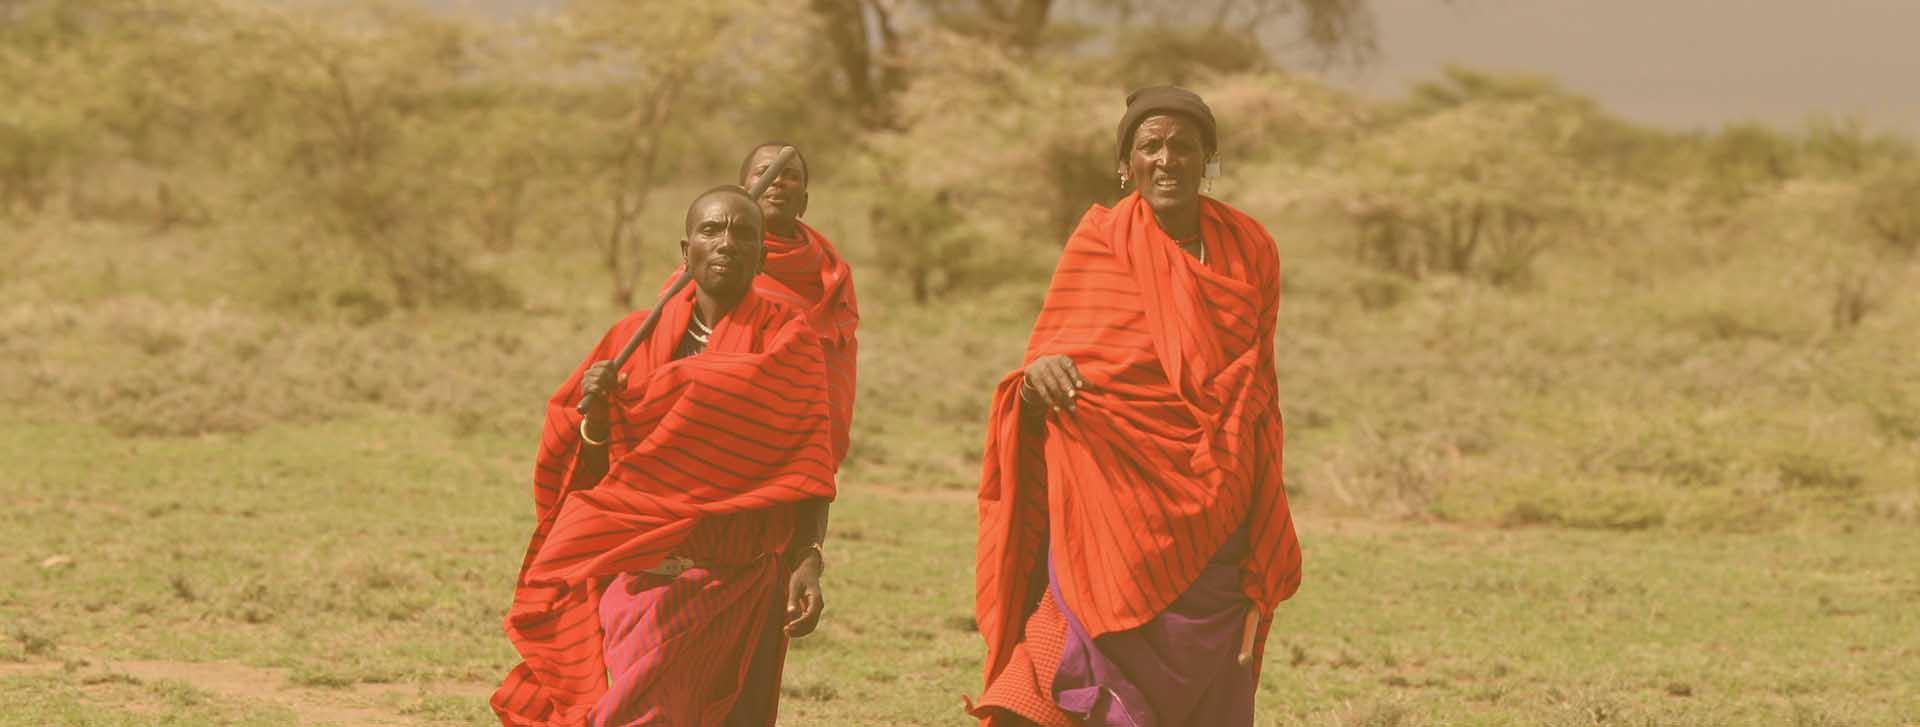 Tanzania Cultural Tour